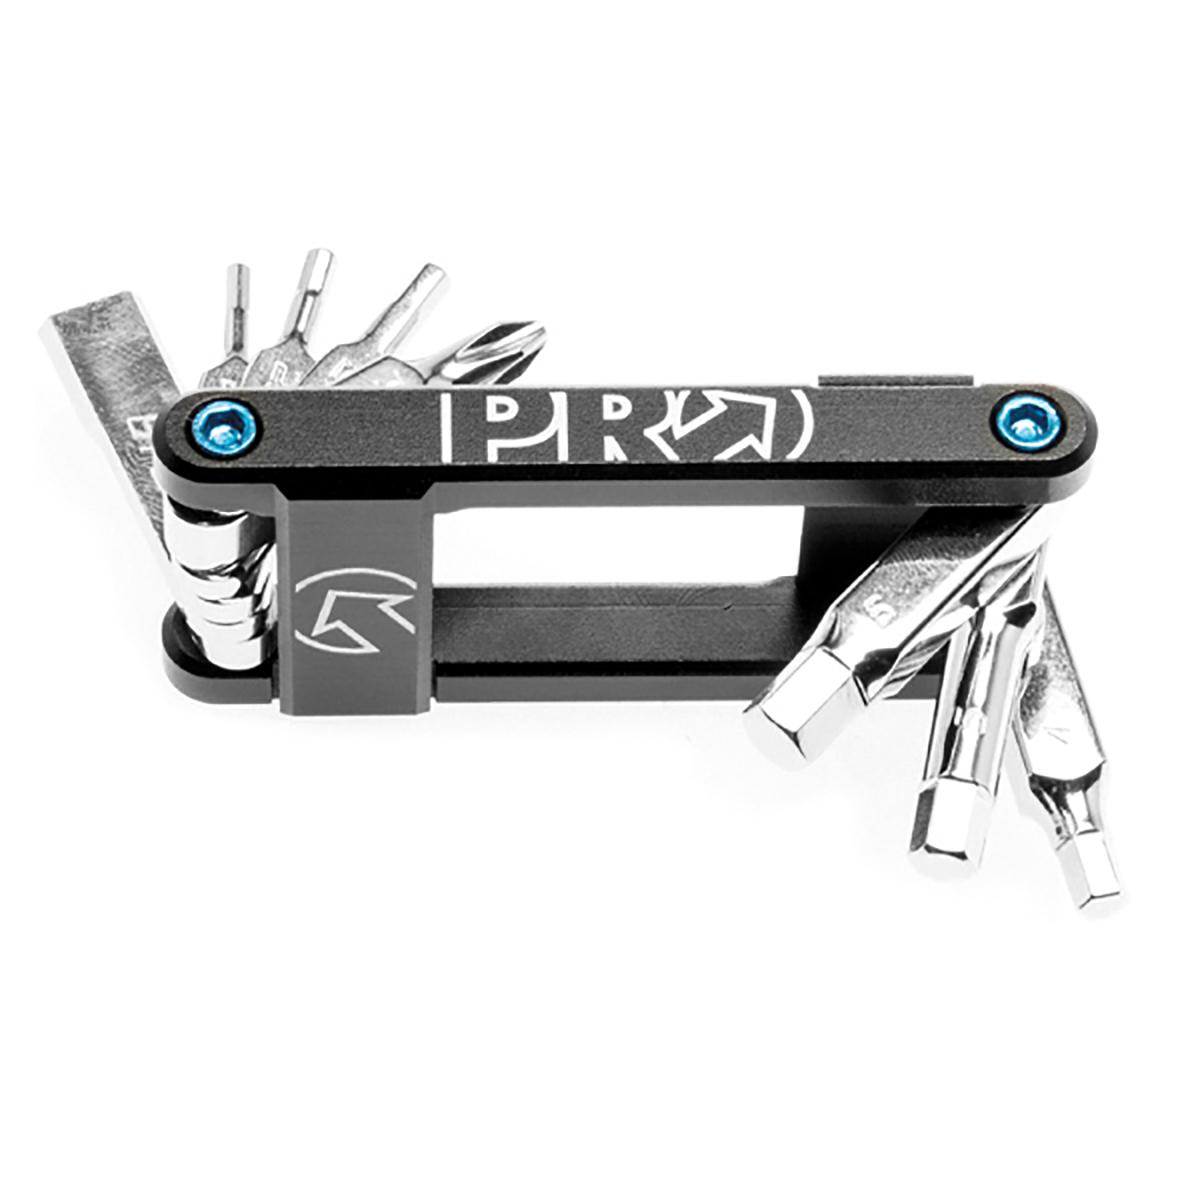 PRO mini zestaw narzędzi 8 Funkcji PRTL0025